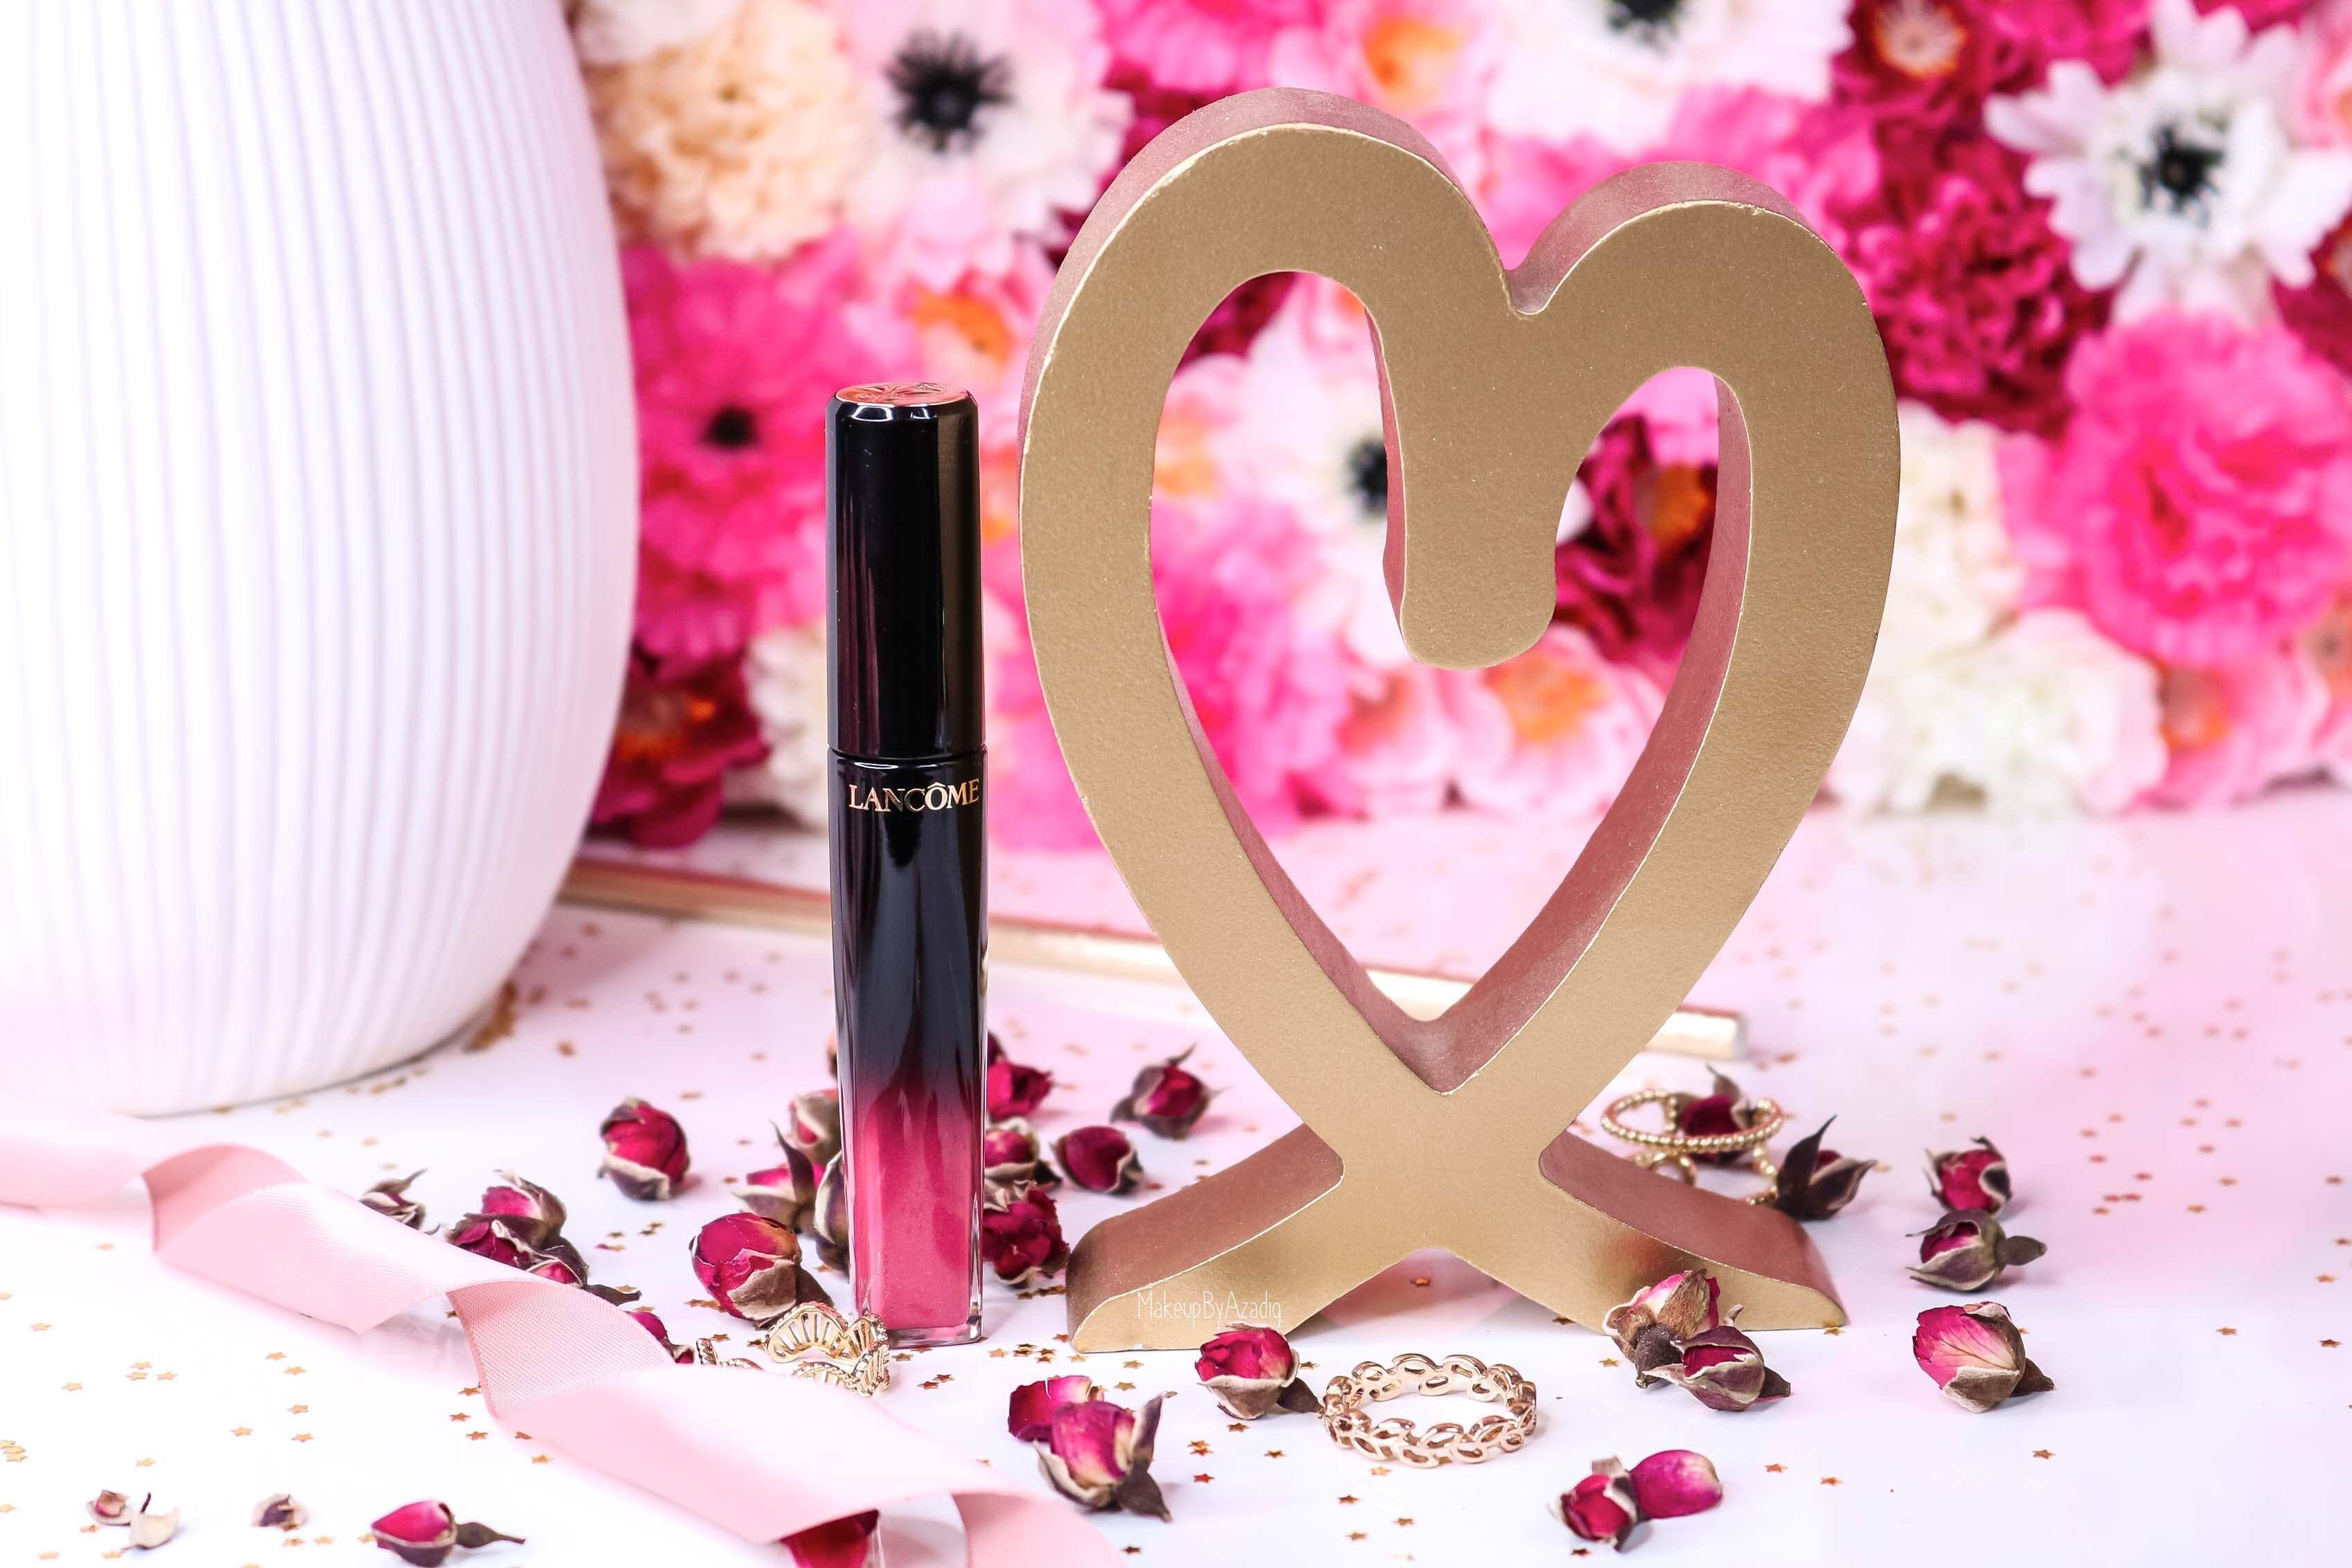 revue-lacque-a-levres-absolu-lacquer-lancome-shine-manifesto-323-sephora-avis-prix-tenue-makeupbyazadig-swatch-rose